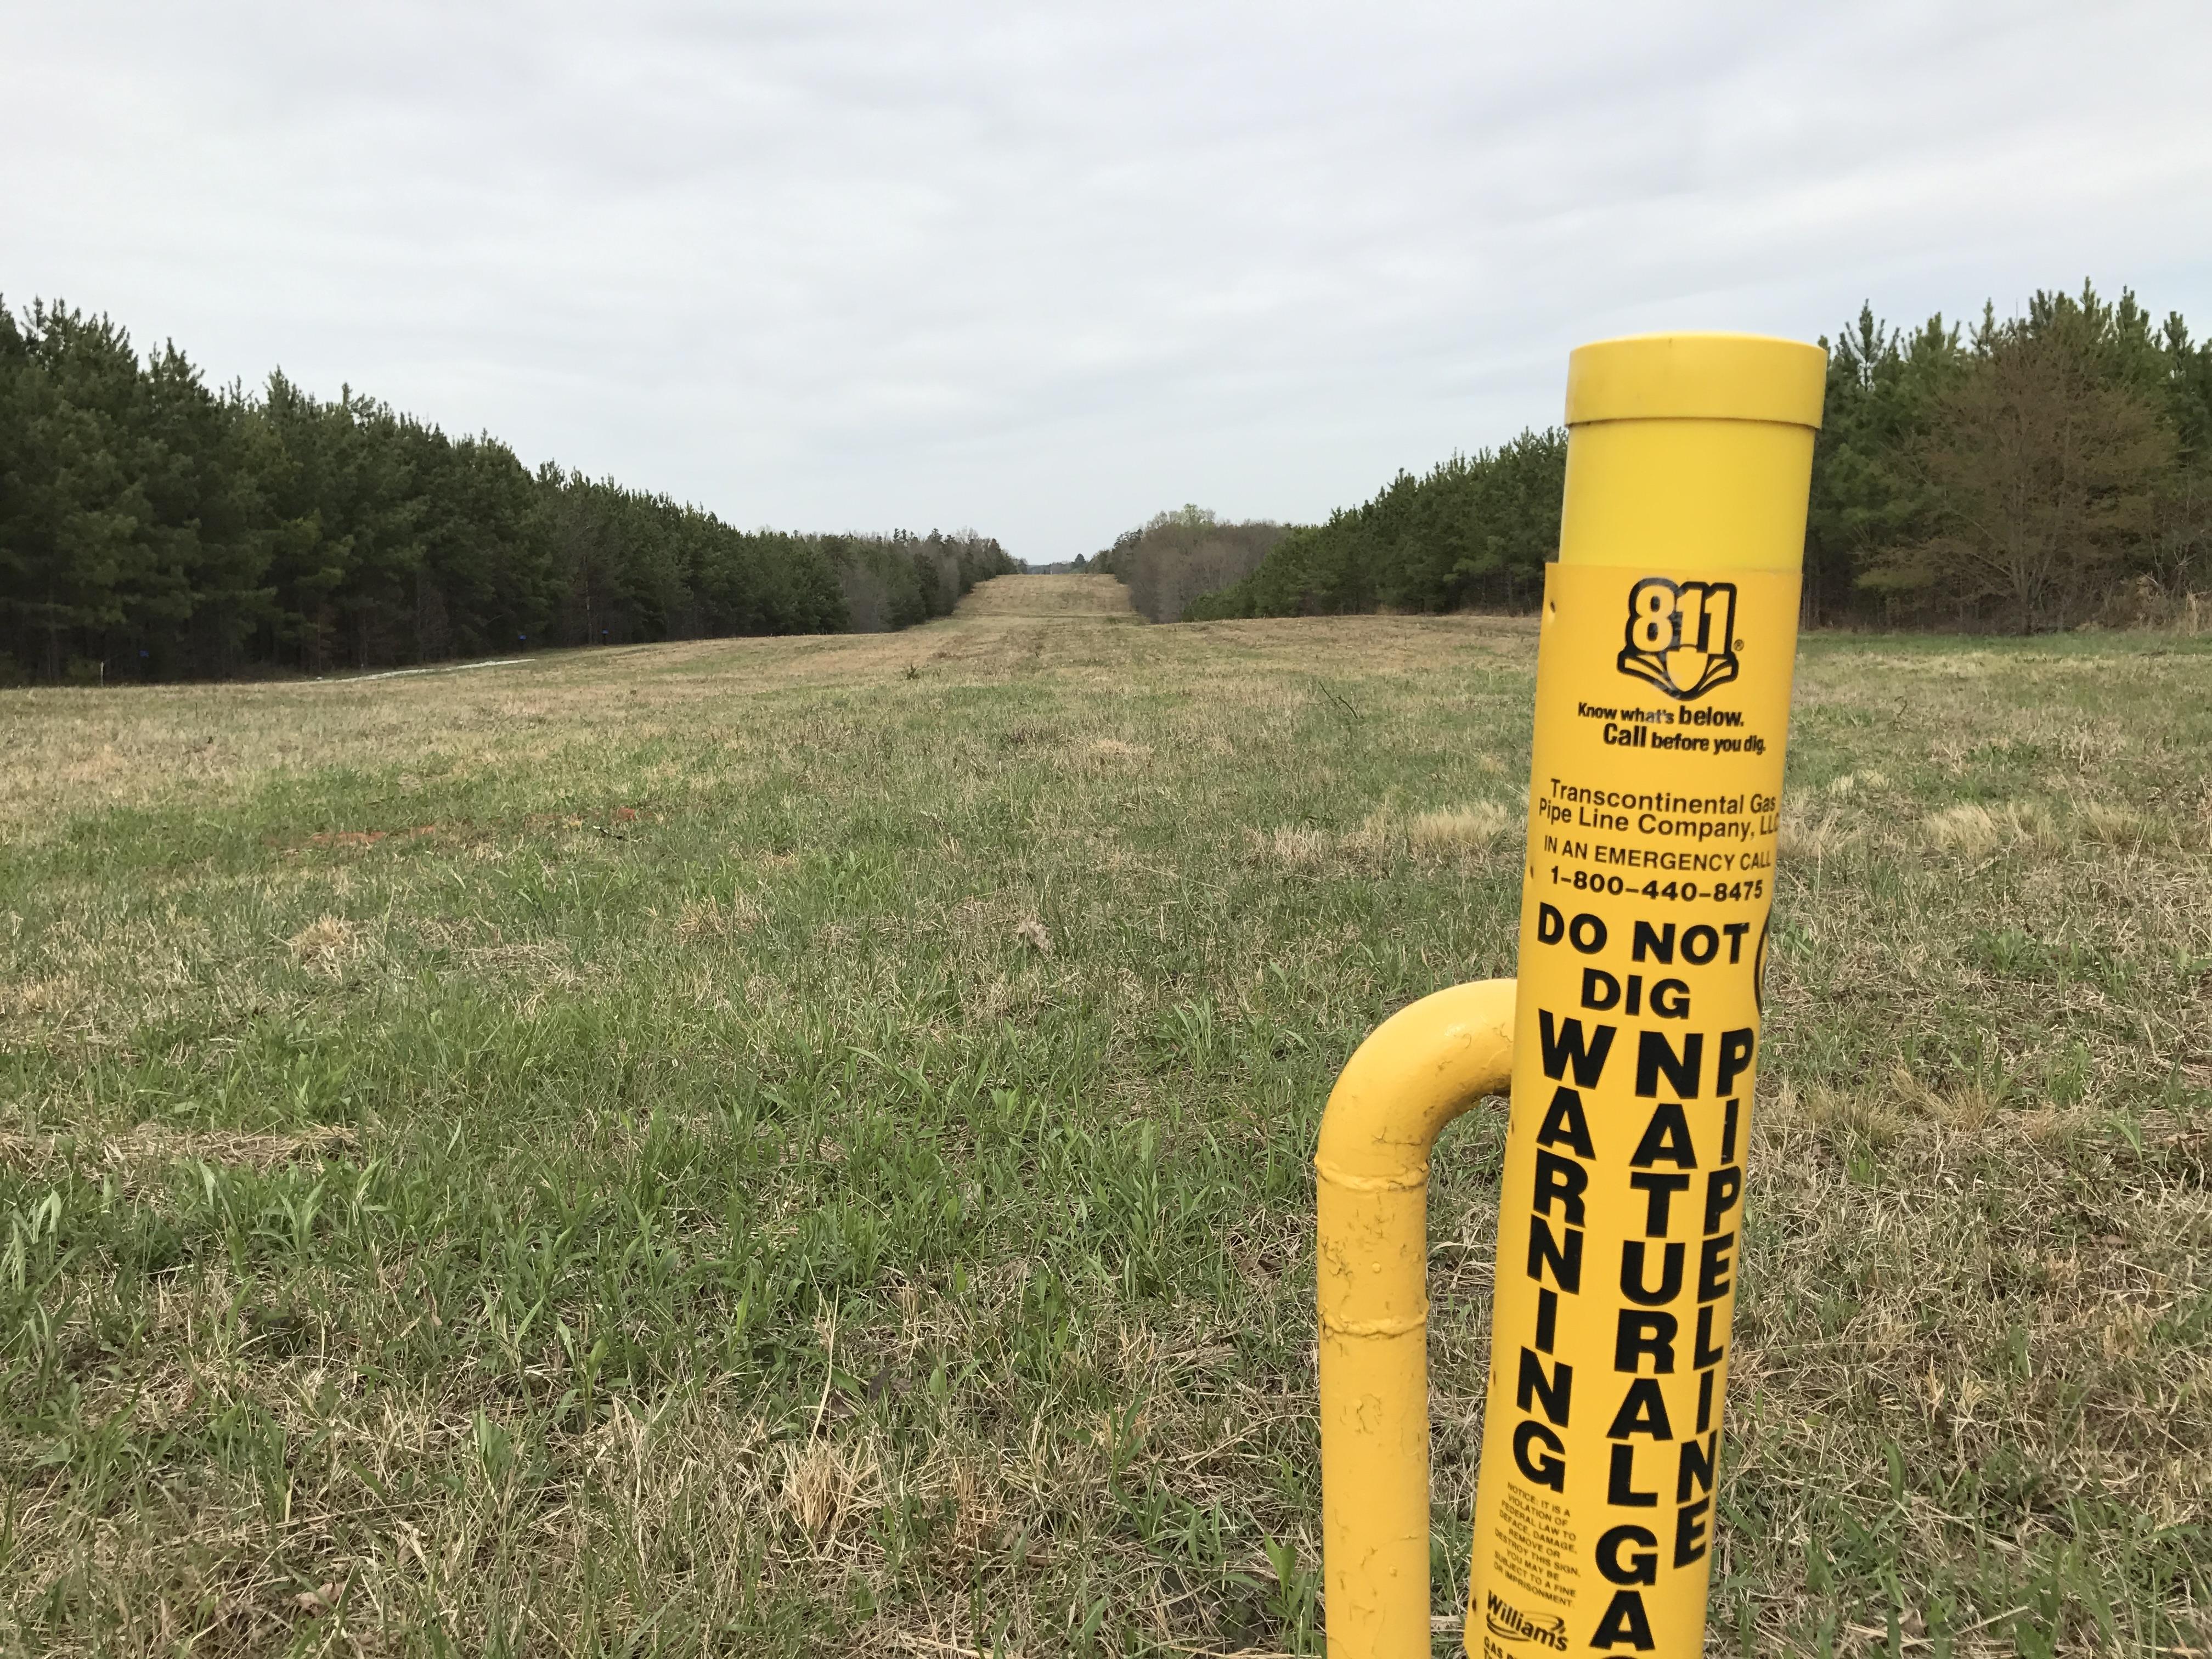 Pipeline agency fails to explain how it assesses risk prioritizes